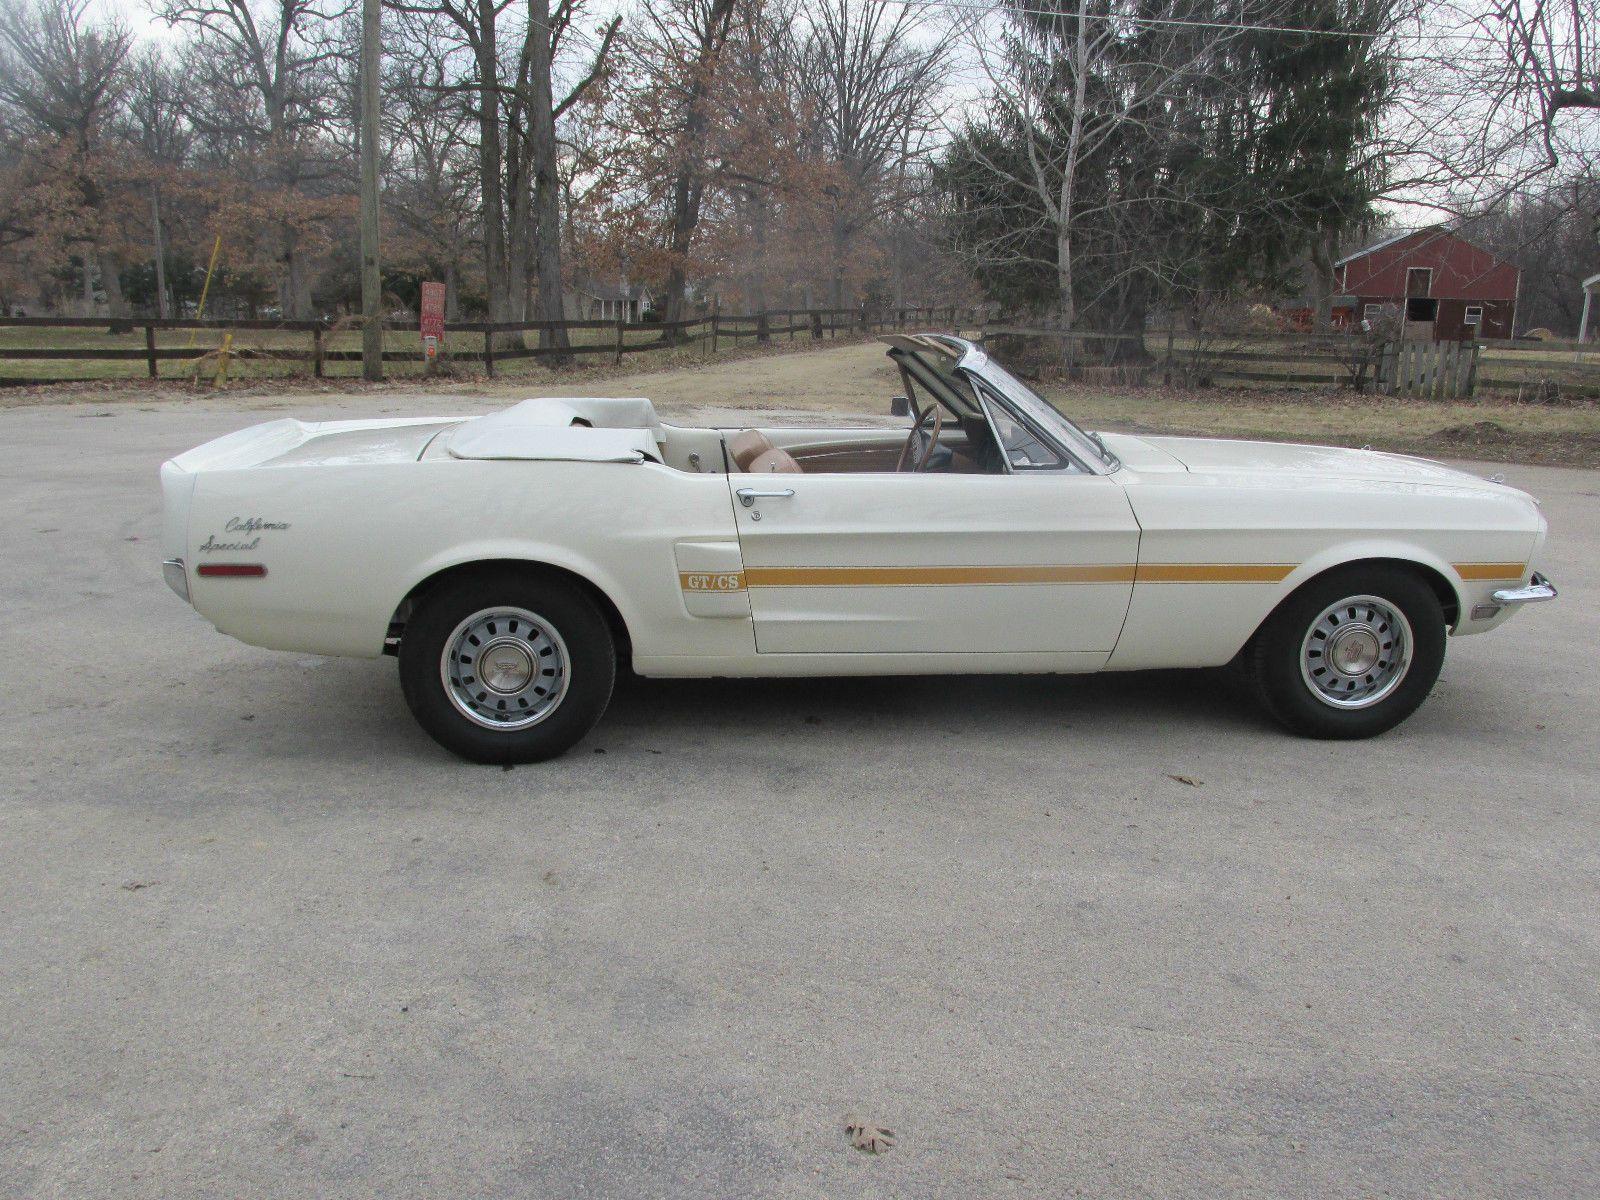 1968 Mustang California Special Convertible Mustang California Special Classic Mustang Mustang Cobra